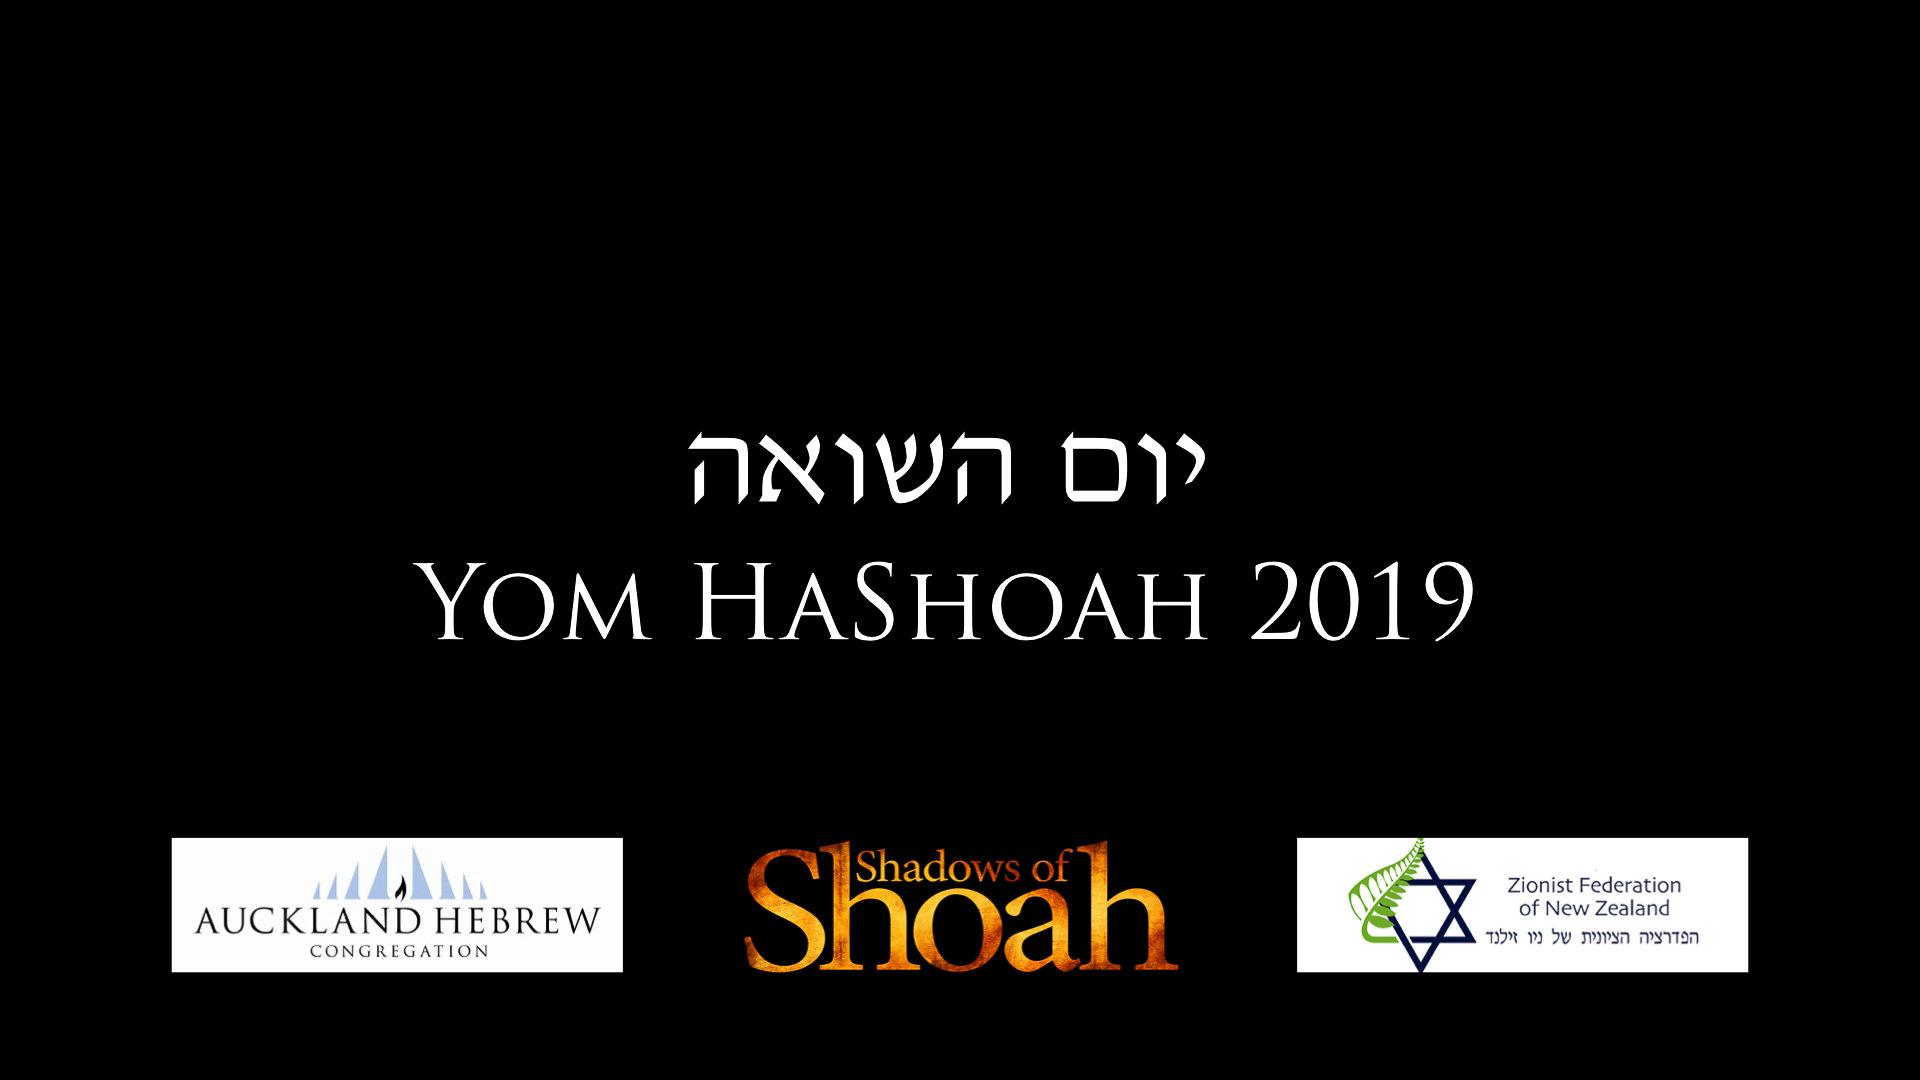 Yom HaShoah Names 2019.jpg